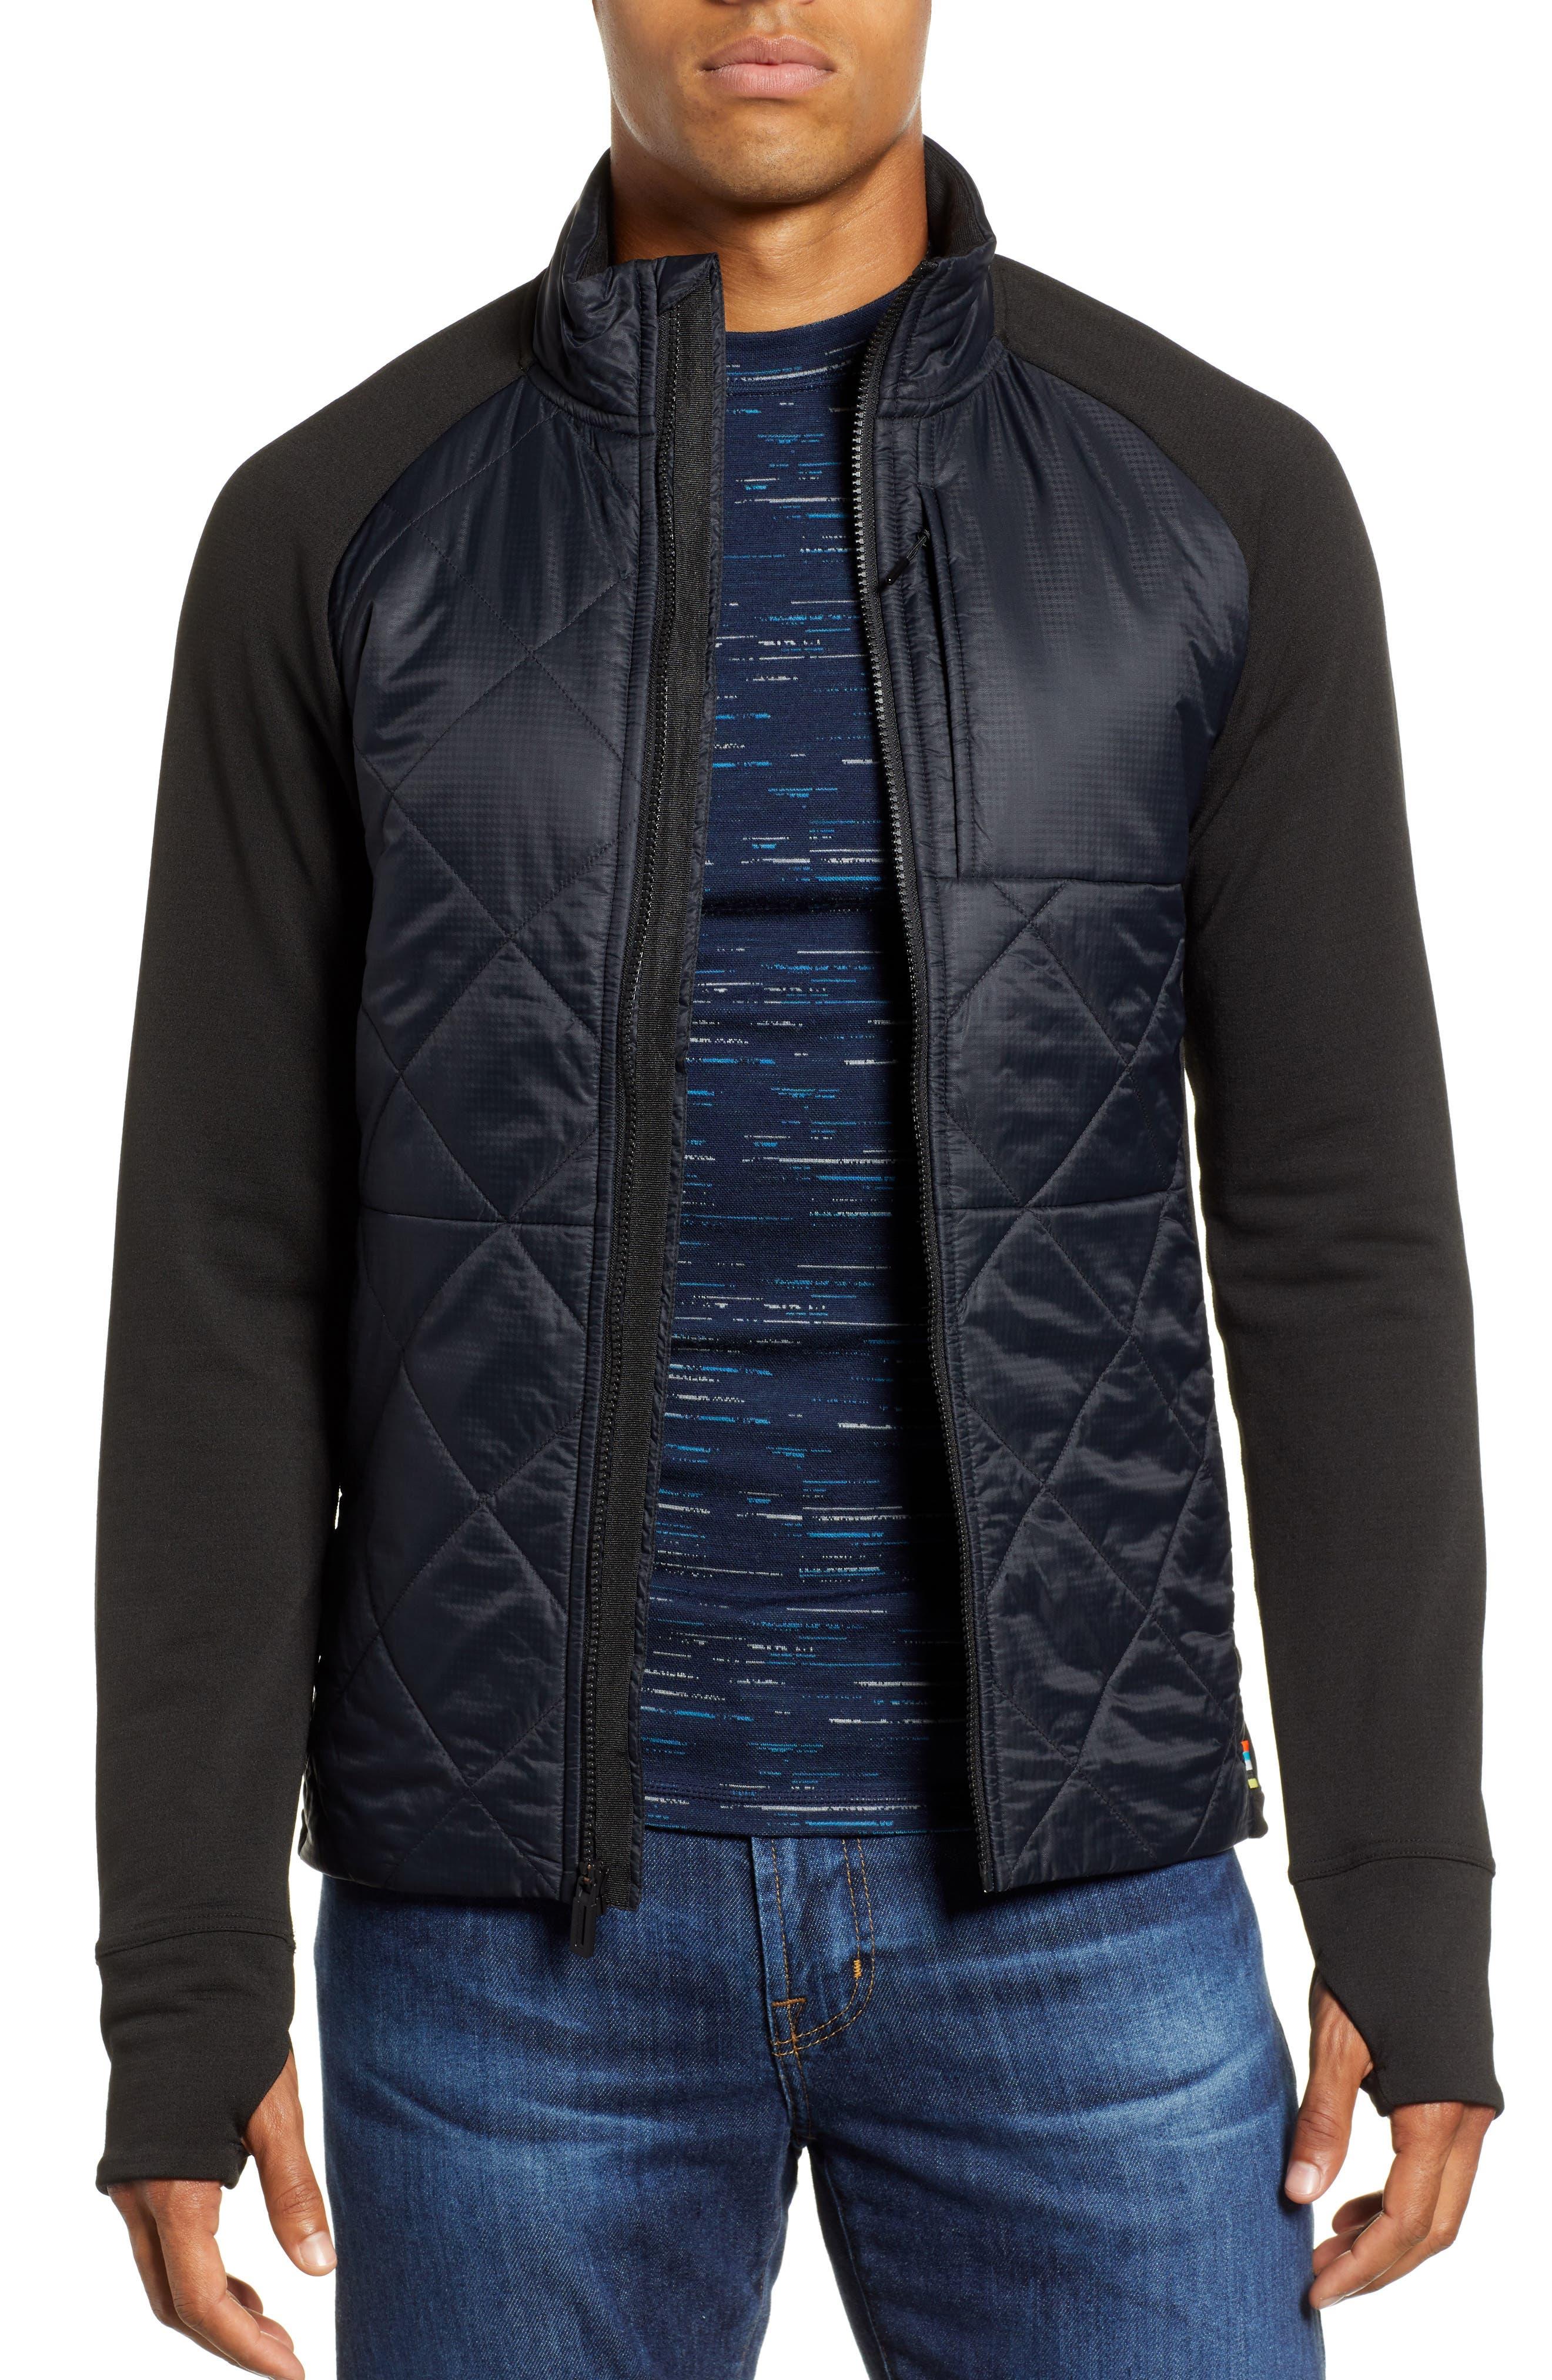 Regular Fit SmartLoft 120 Jacket,                             Main thumbnail 1, color,                             BLACK